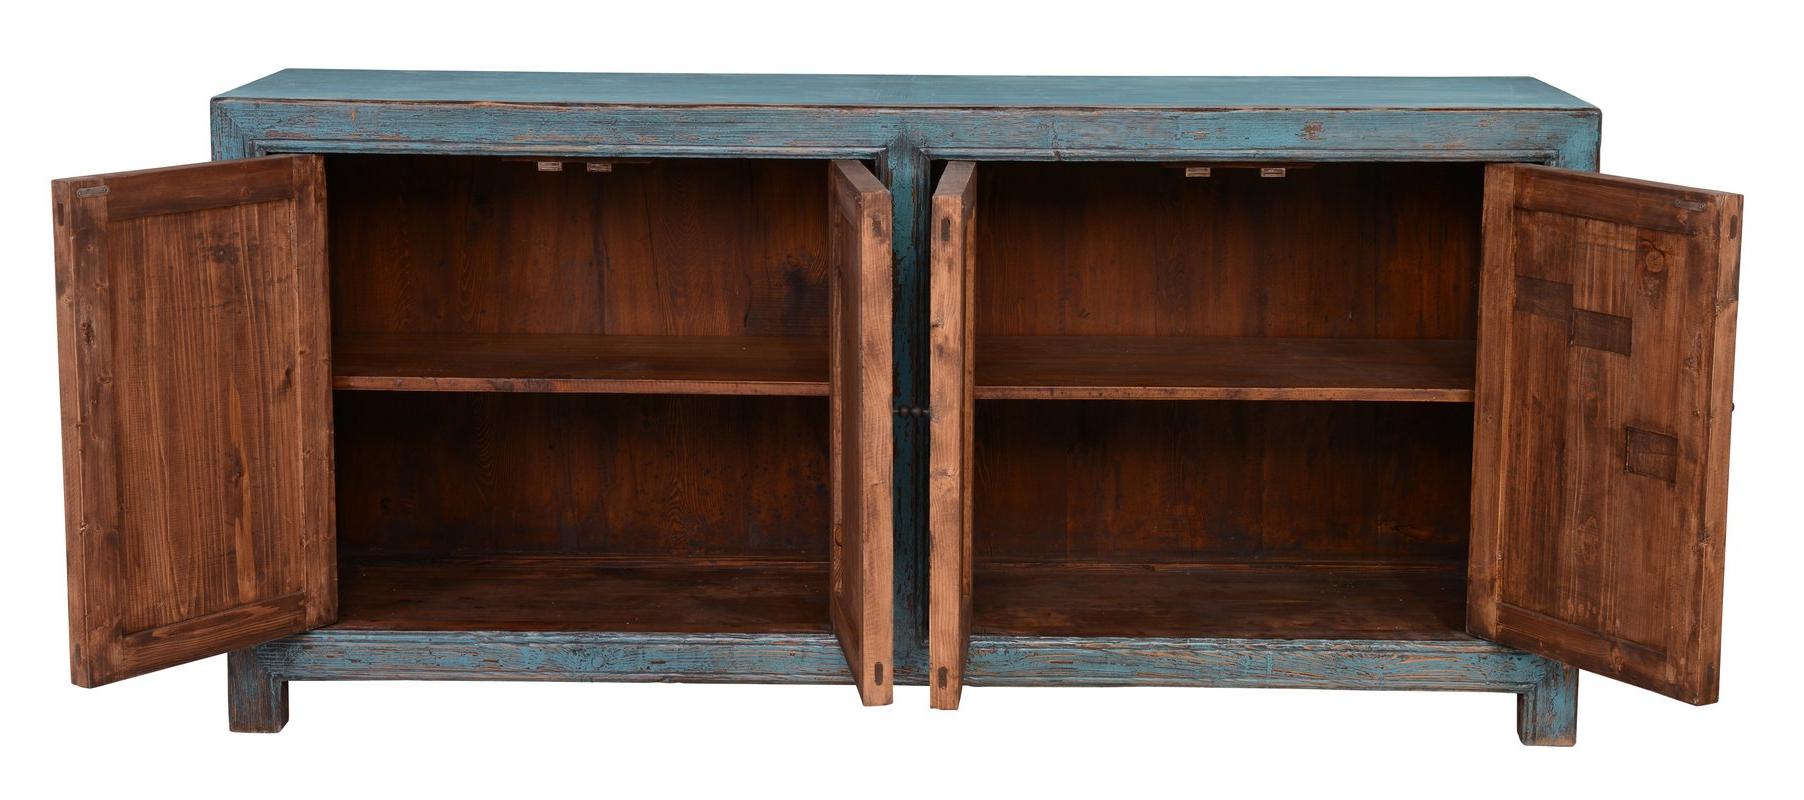 Latest August Grove Mahoning Reclaimed Pine 4 Door Sideboard & Reviews With Regard To Reclaimed Pine Turquoise 4 Door Sideboards (Gallery 5 of 20)